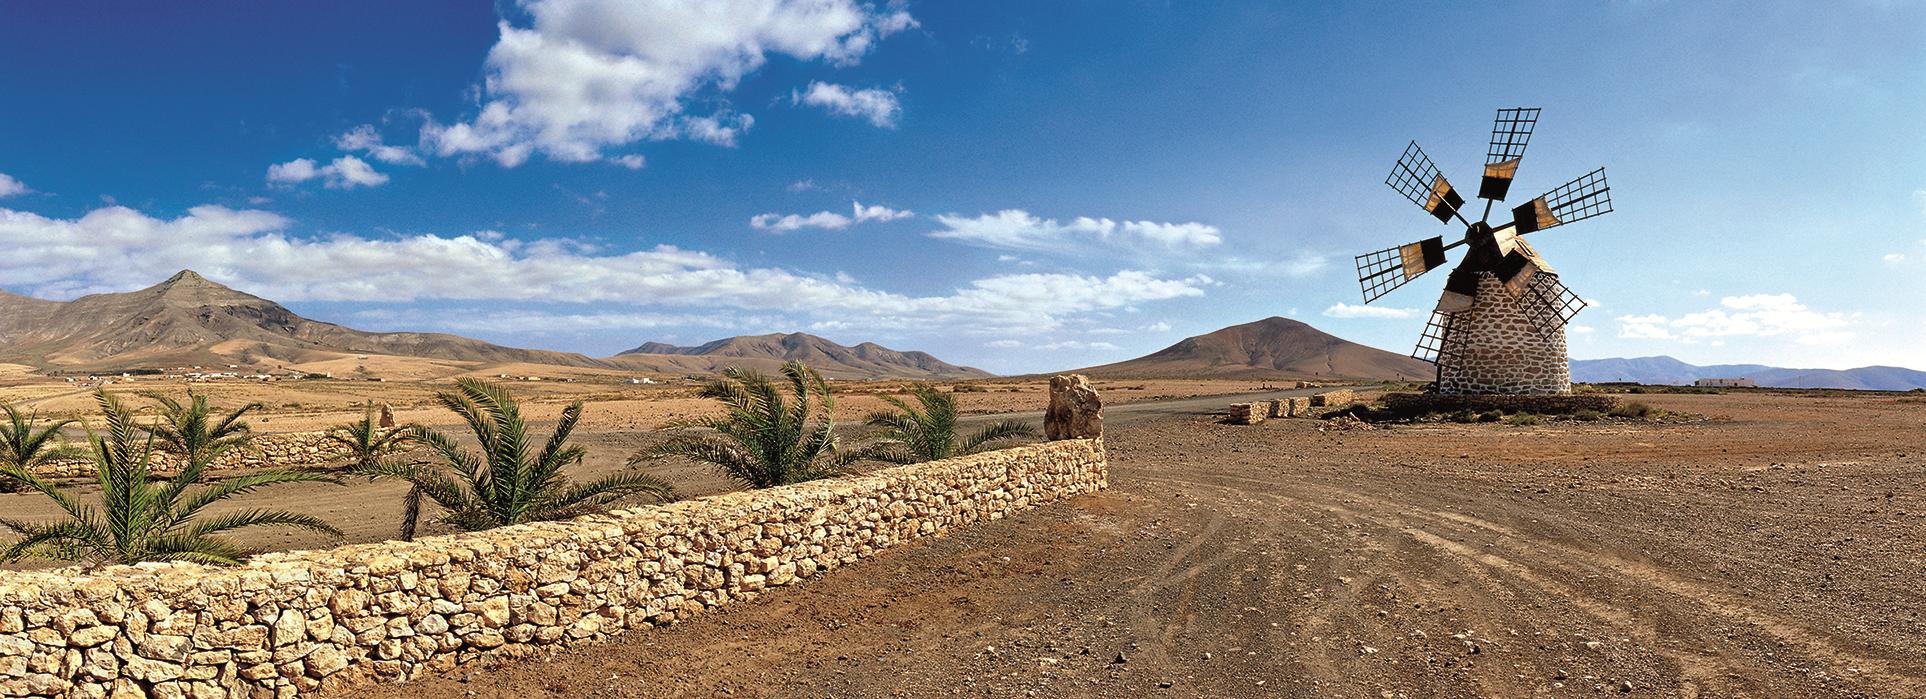 Fuerteventura__3_